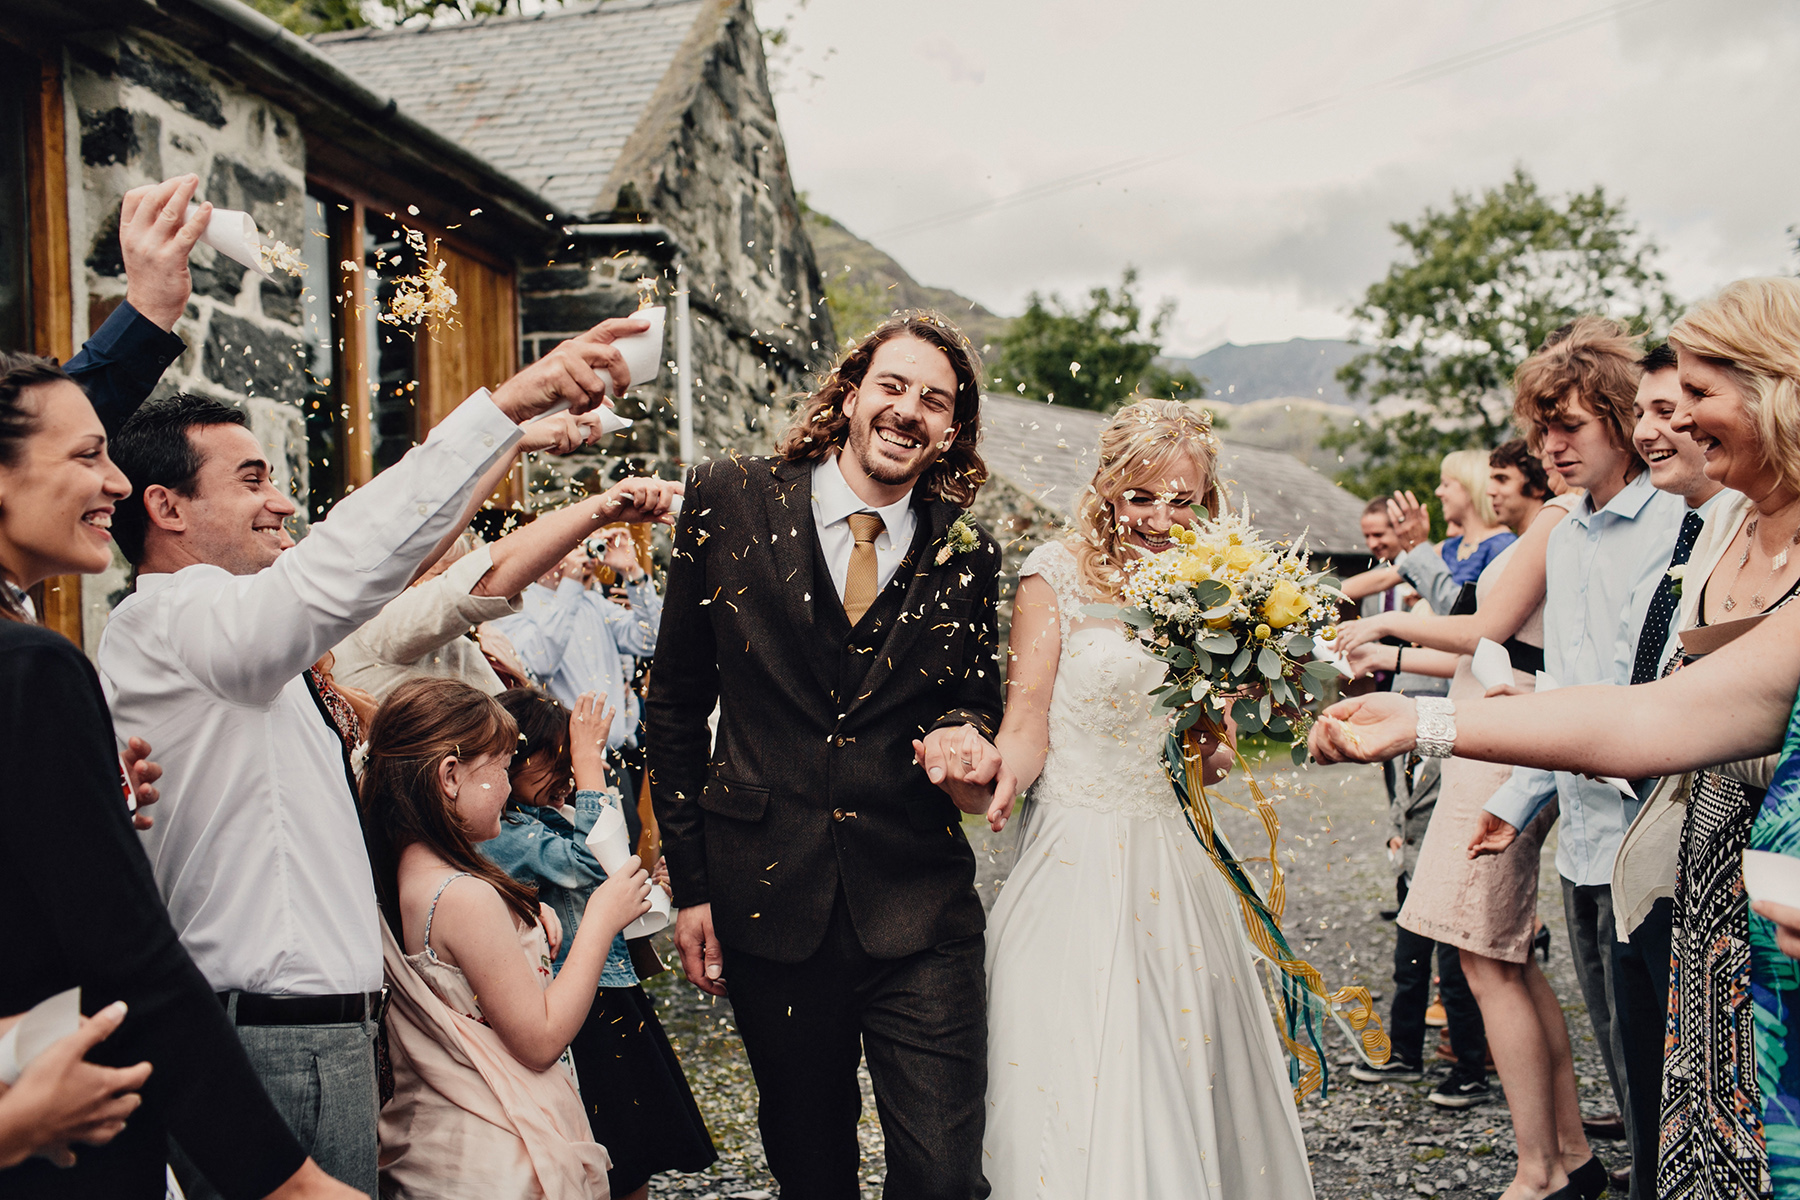 Snowdonia-Wales-Wedding-Photos-0335.jpg